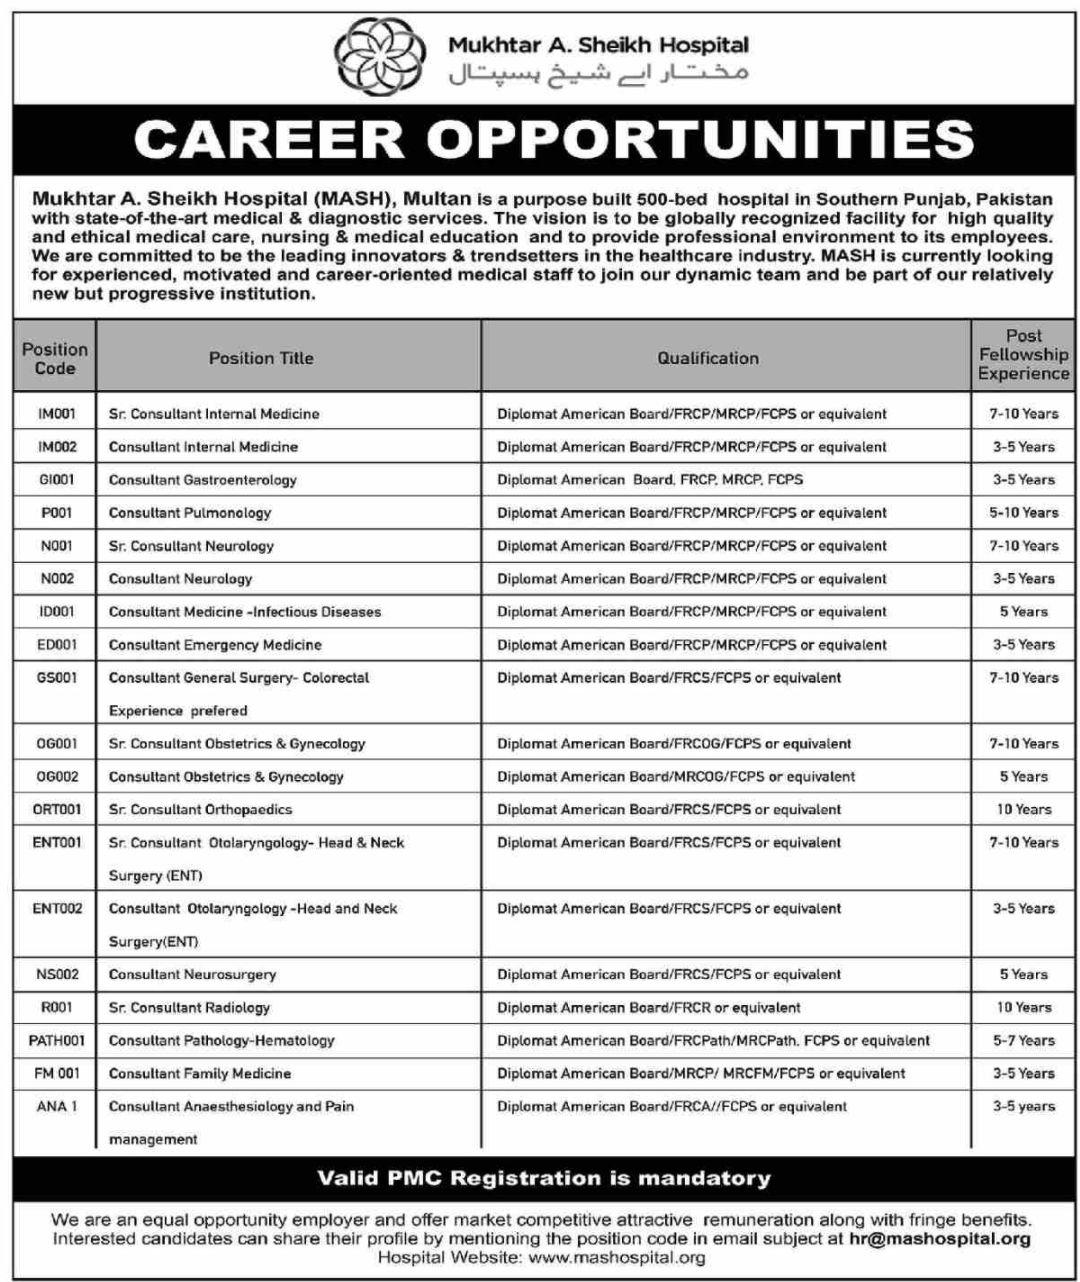 Mukhtar A Sheikh Hospital Vacancies 2021 1